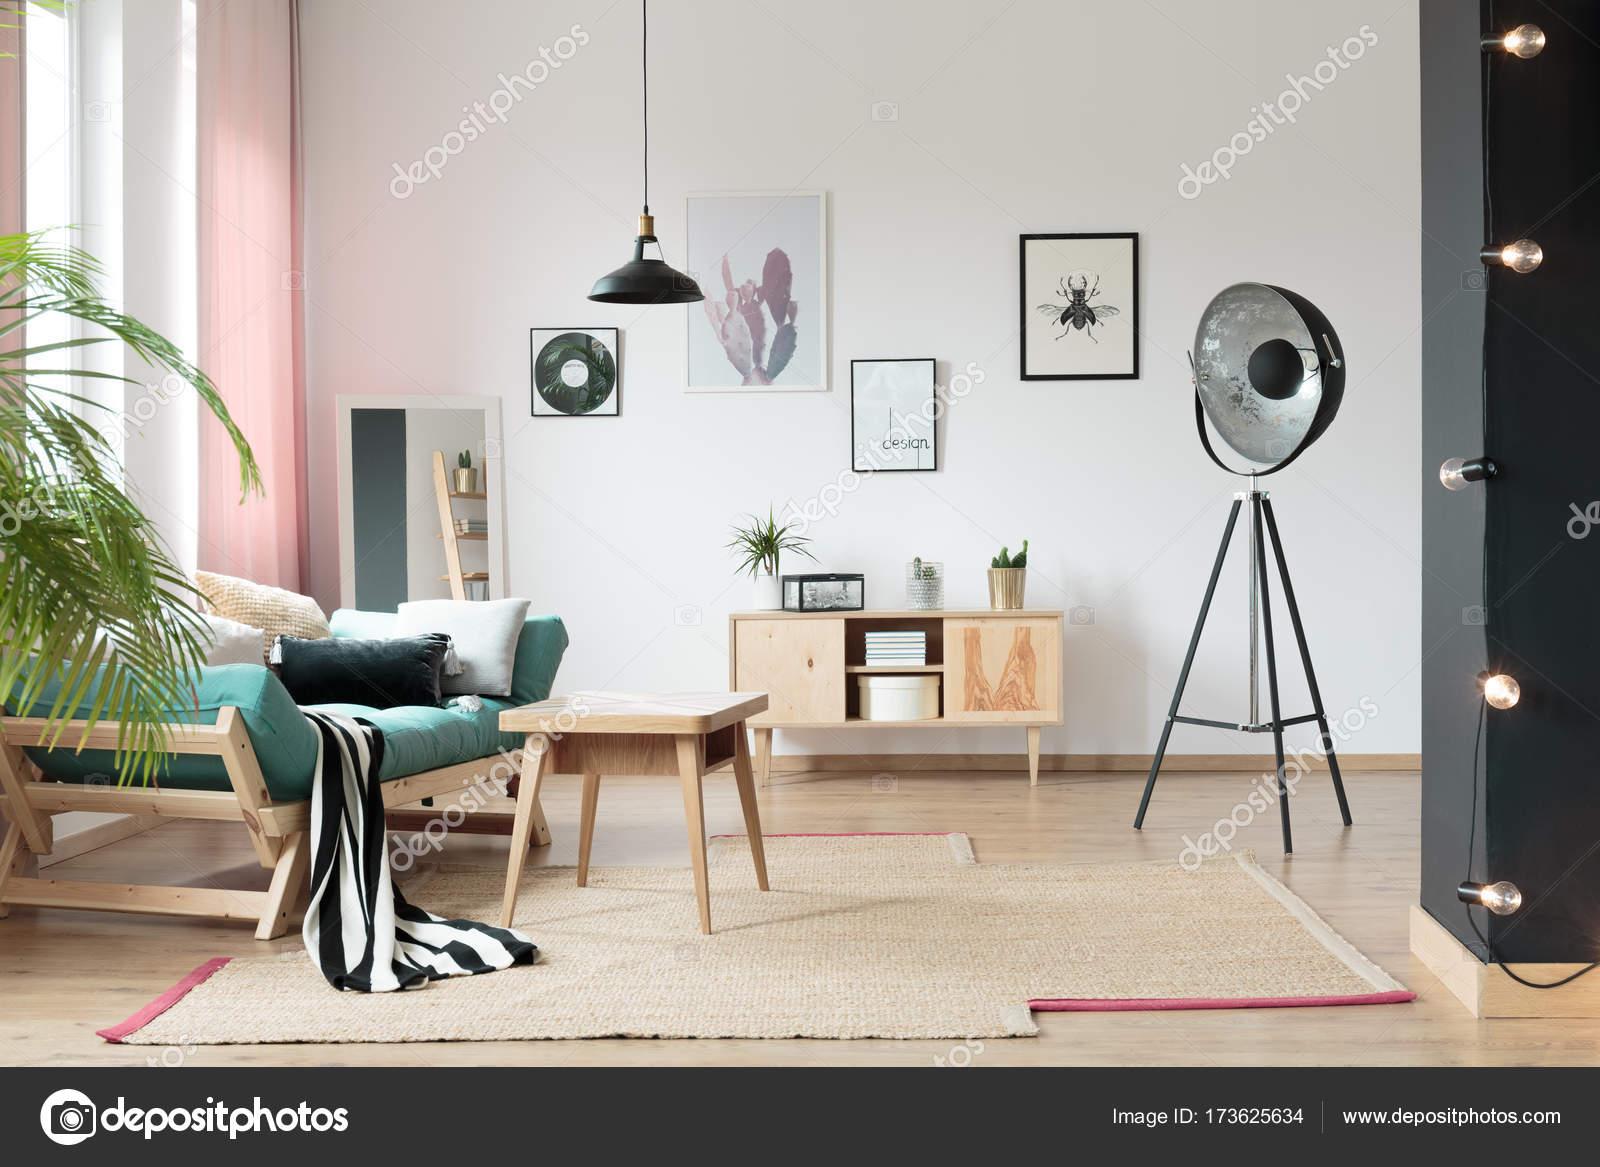 Kleurrijke Interieurs Pastel : Pastel woonkamer interieur u2014 stockfoto © photographee.eu #173625634